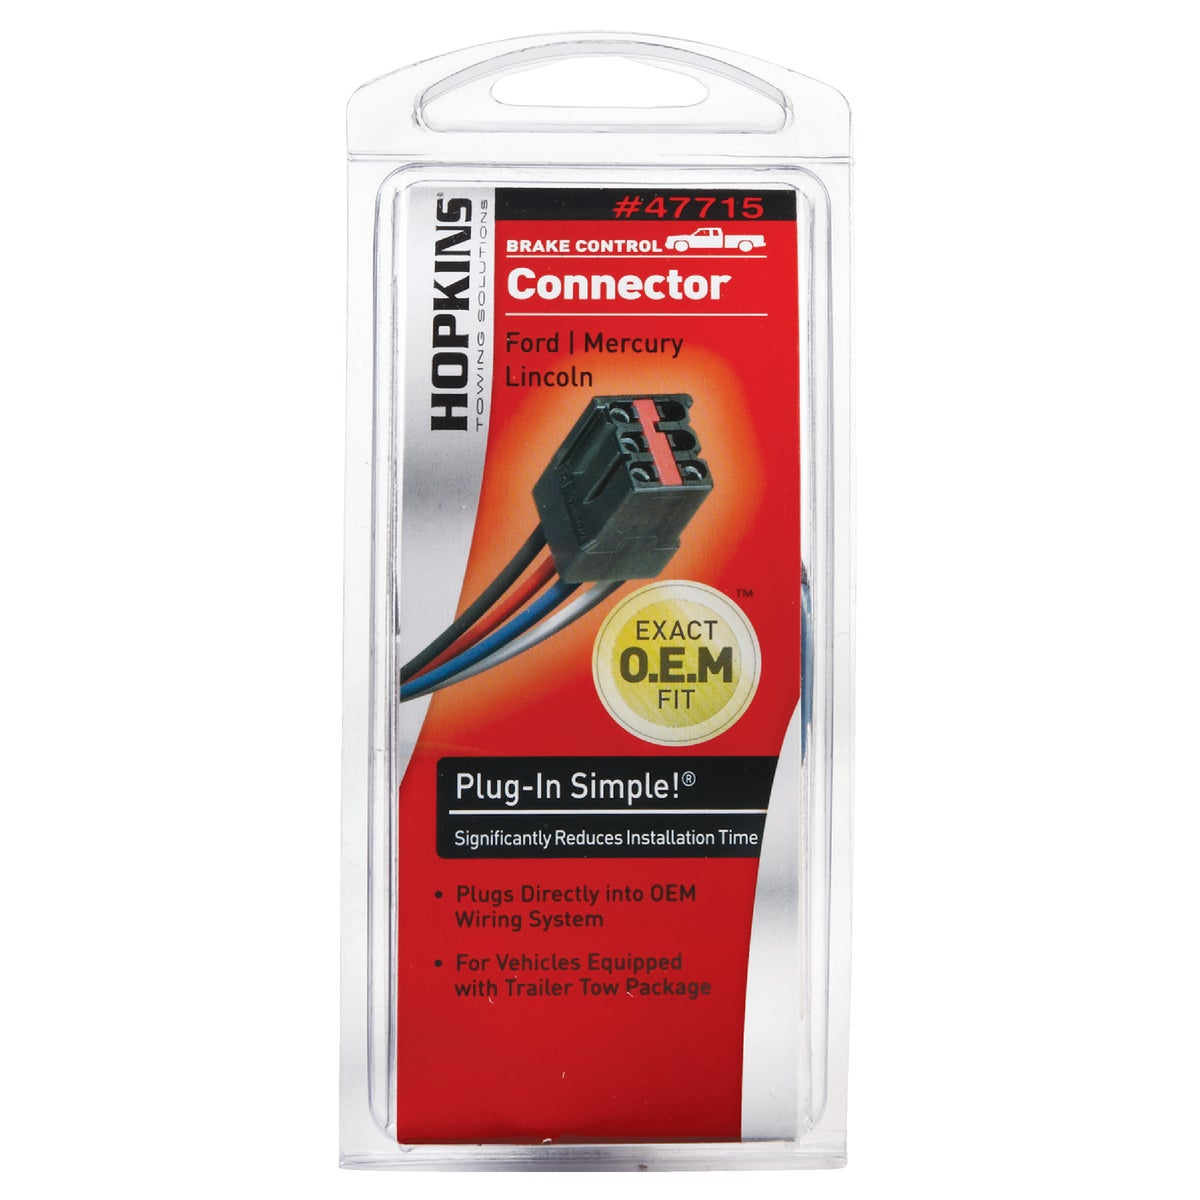 FRD BRAKE CTRL CONNECTOR - 47715 by Hopkins Mfg Corp